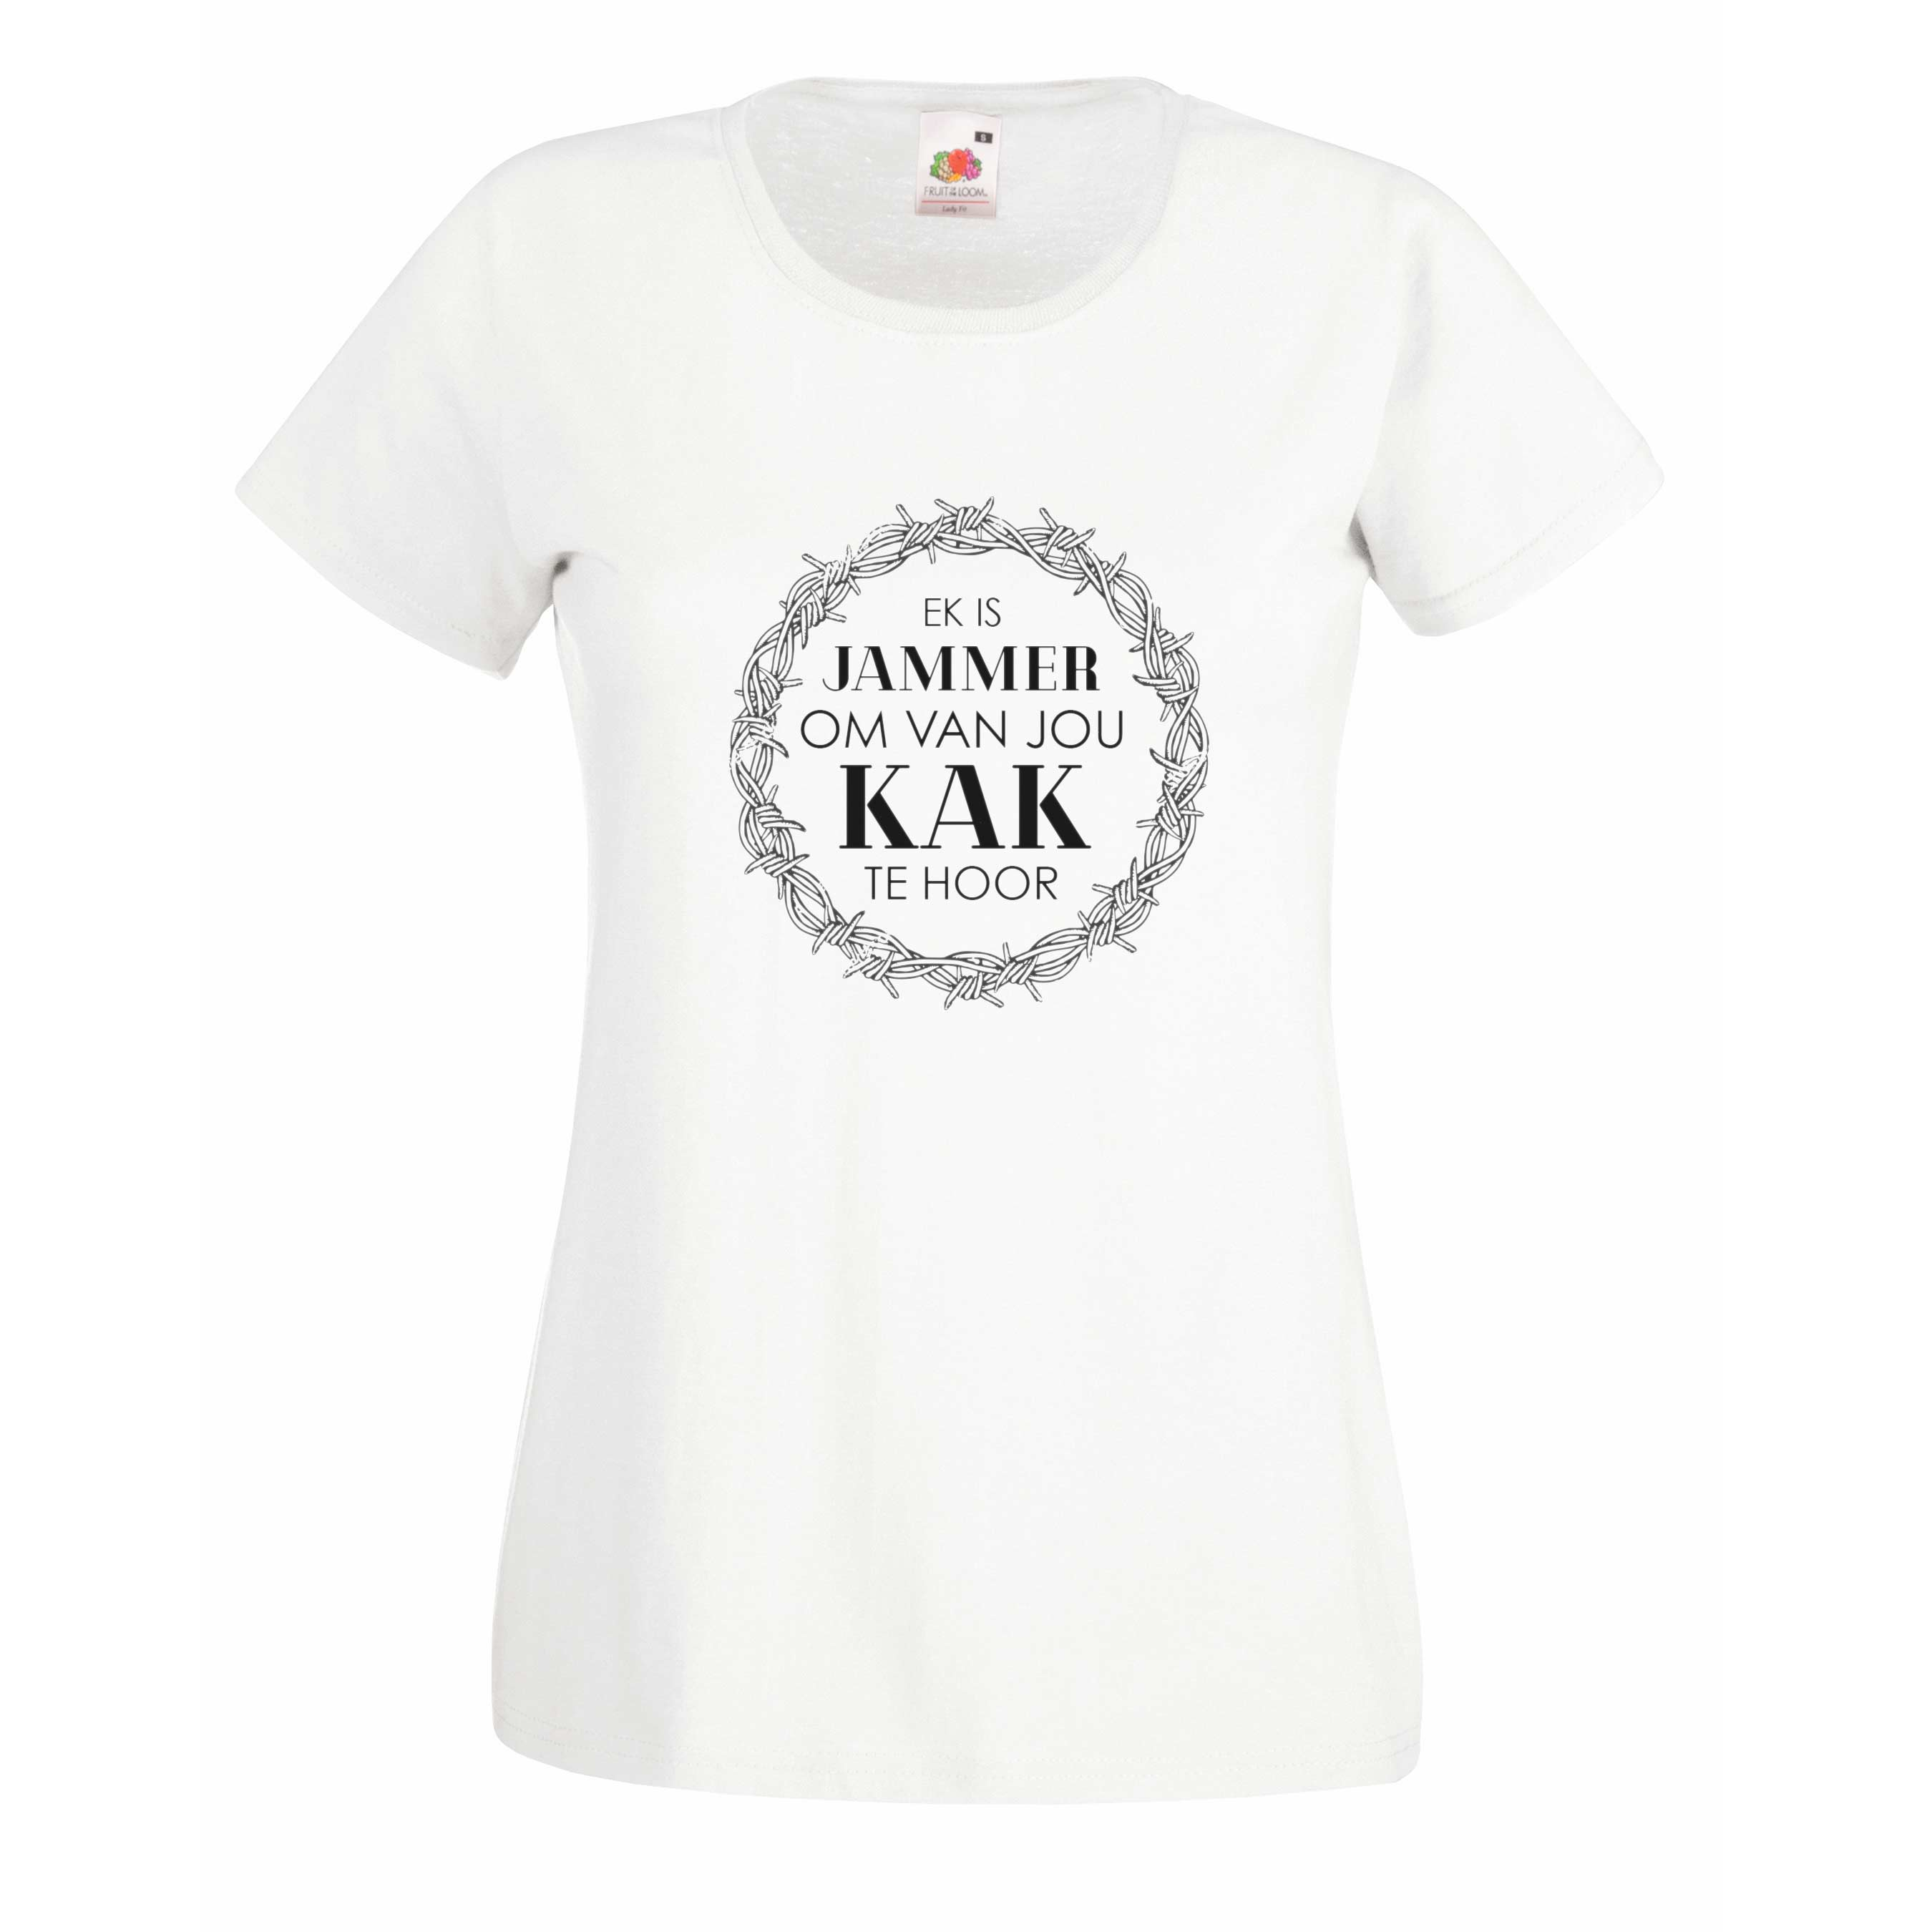 Kak Te Hoor design for t-shirt, hoodie & sweatshirt